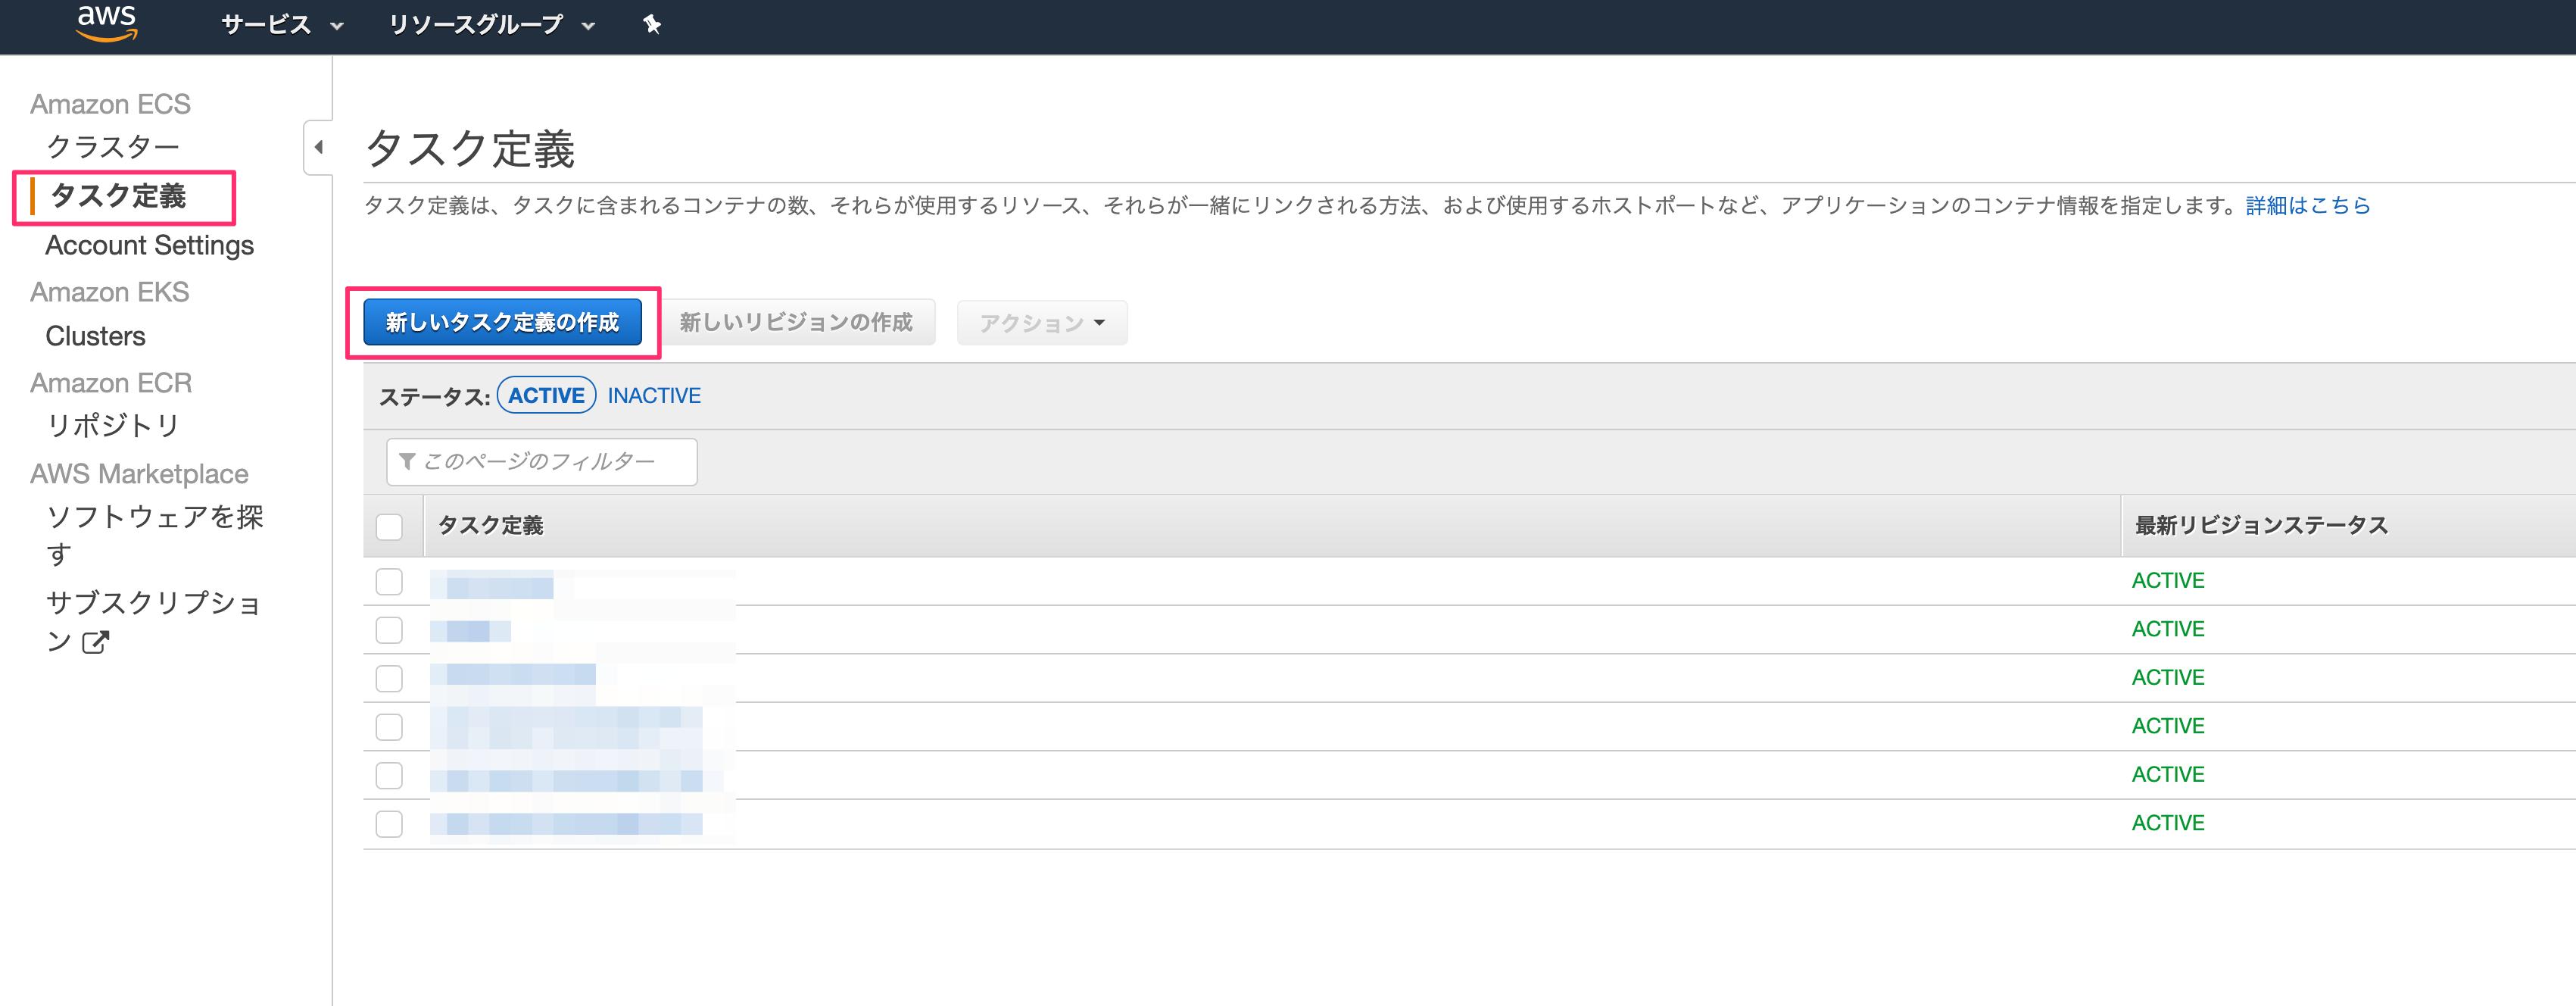 03_create_ecs_task_definition.png